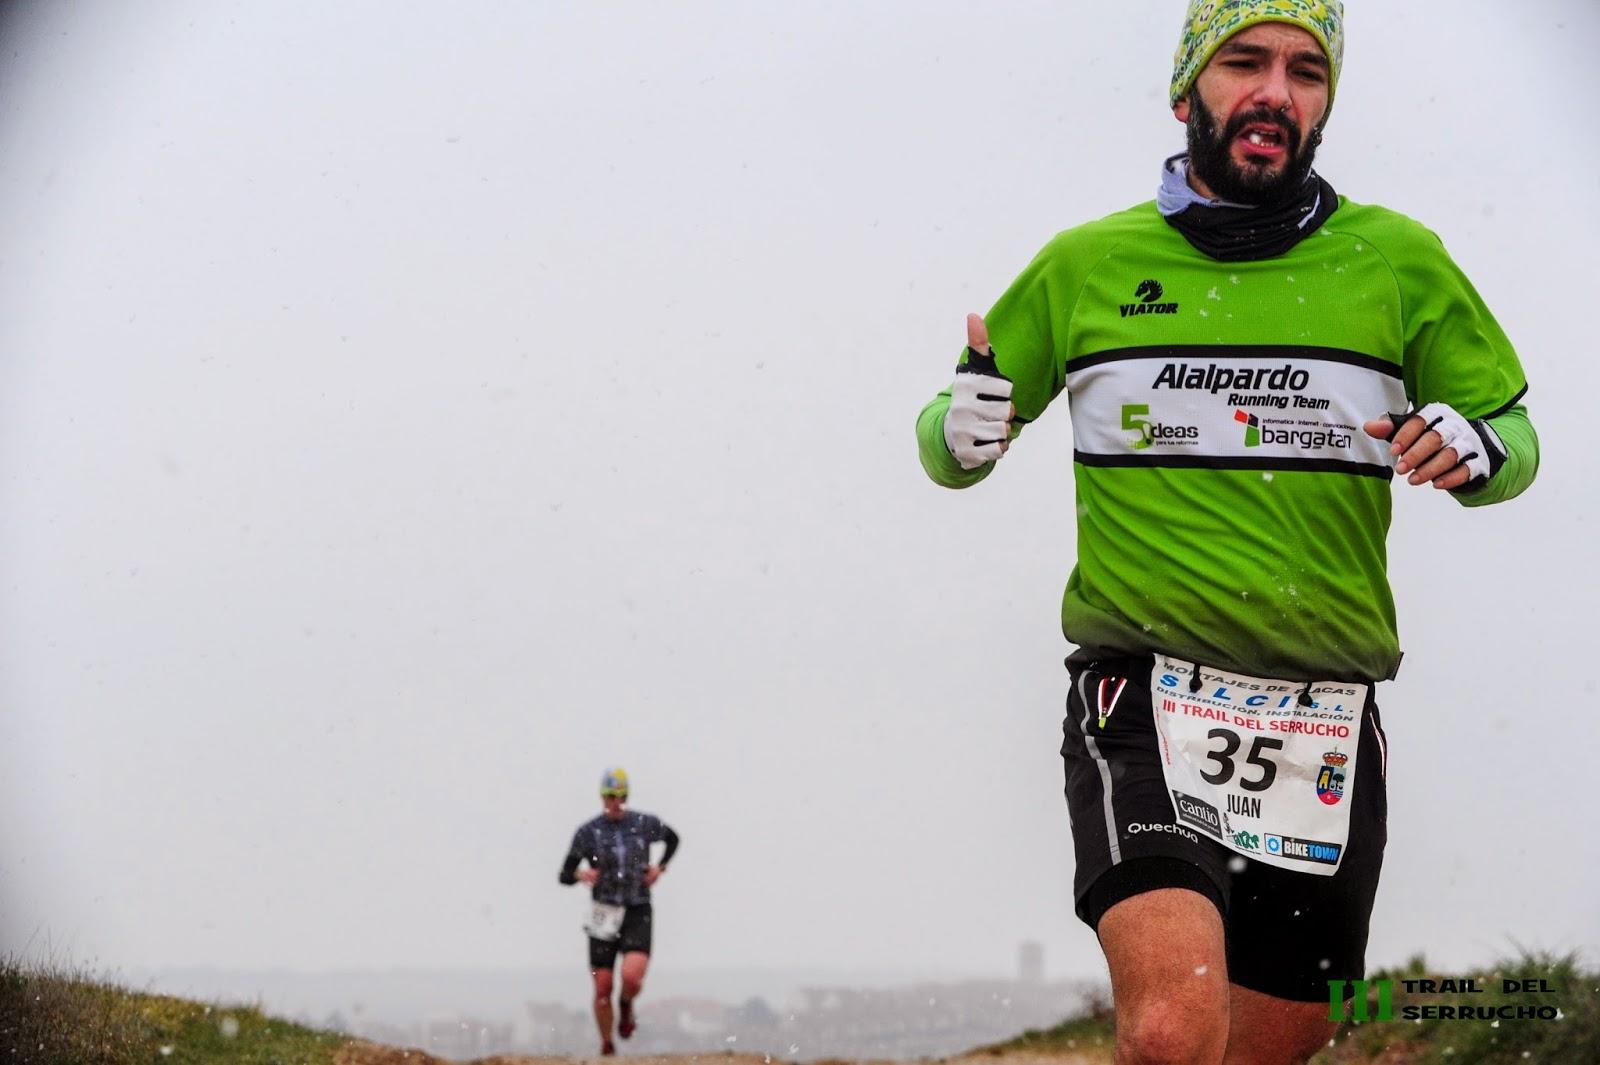 III Trail del Serrucho 2015